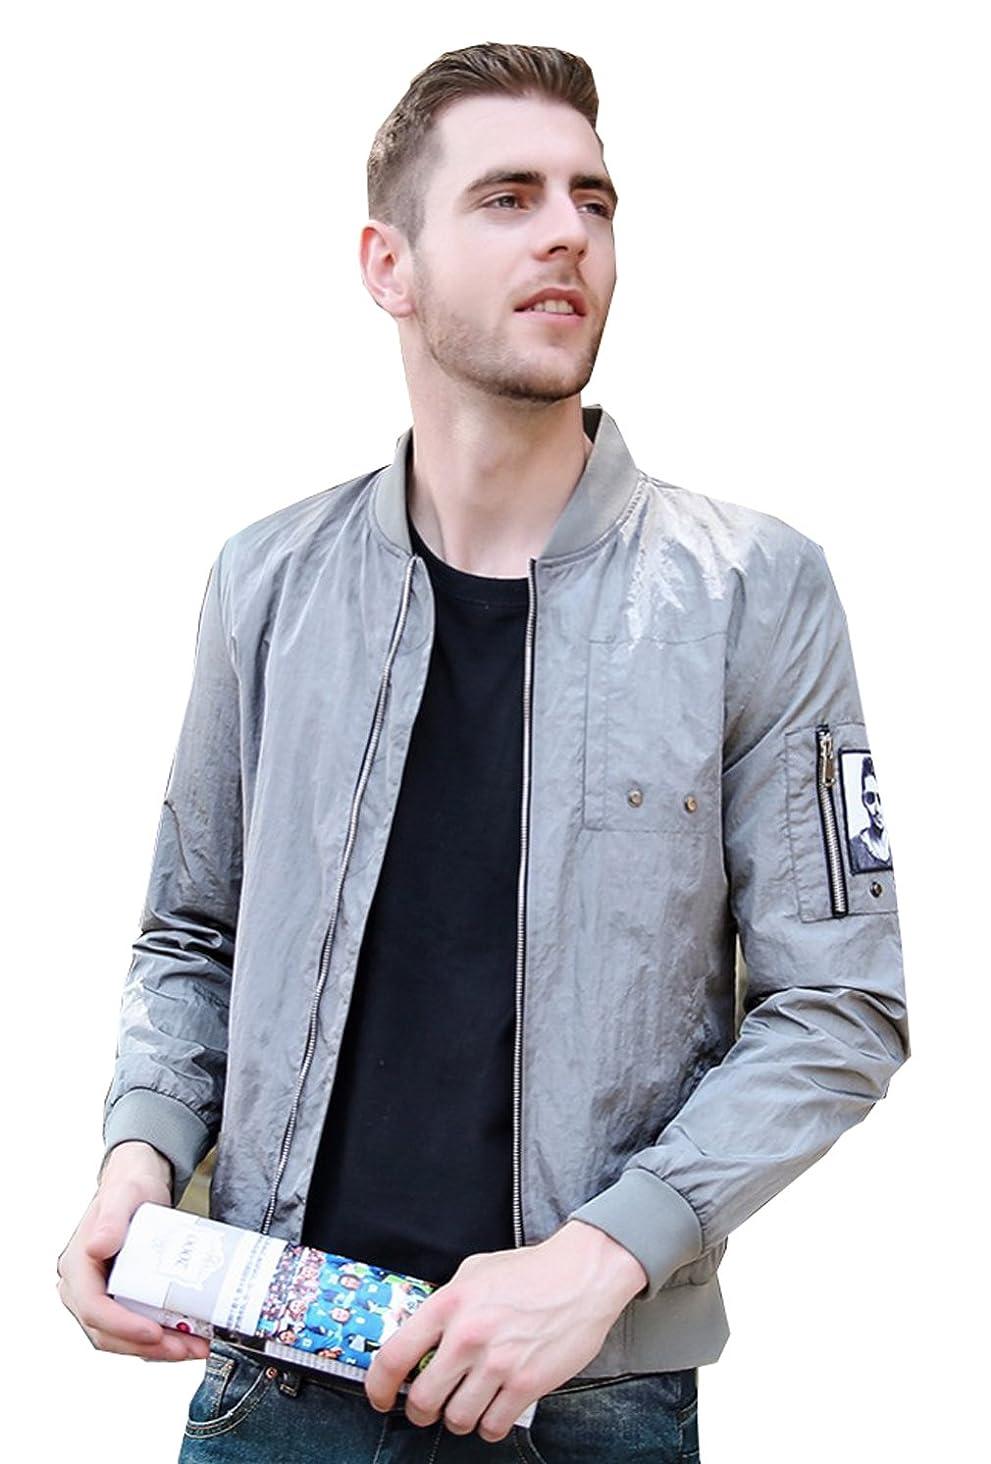 UNbox-HT Mens Casual Jacket Spring Design Bomber Veste Homme Military Outwear